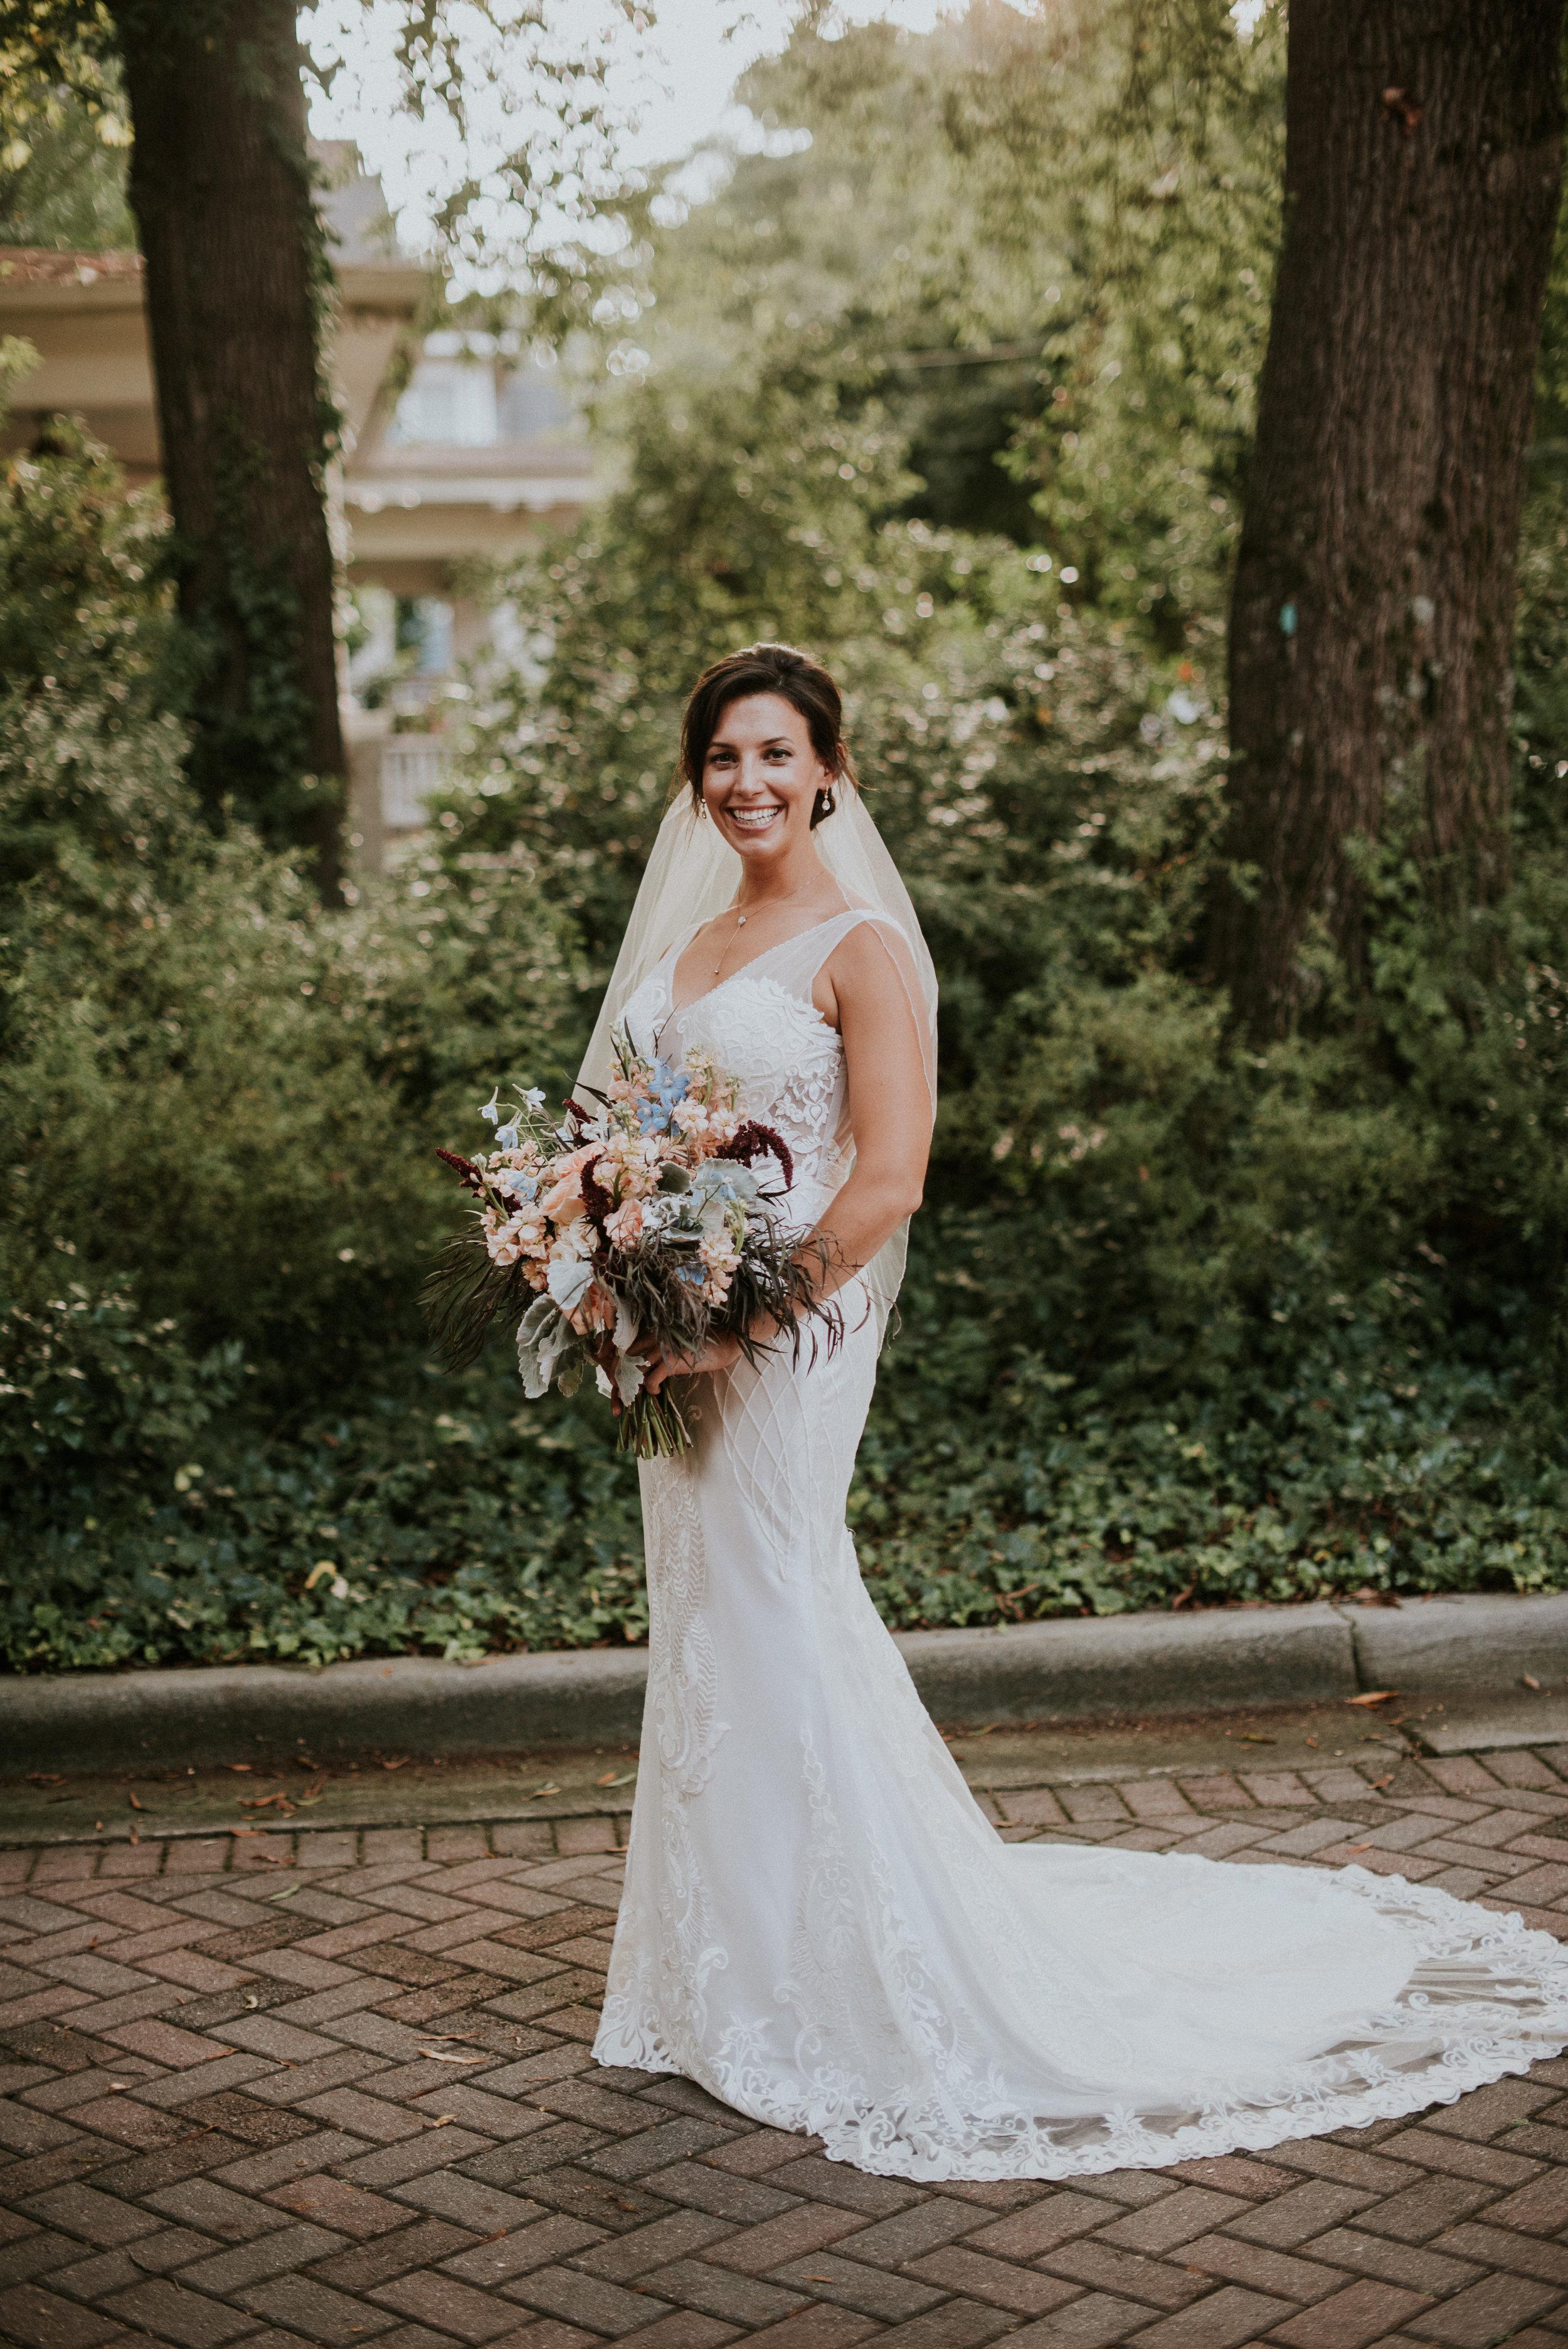 Portrait of bride in Simply Bridal wedding dress